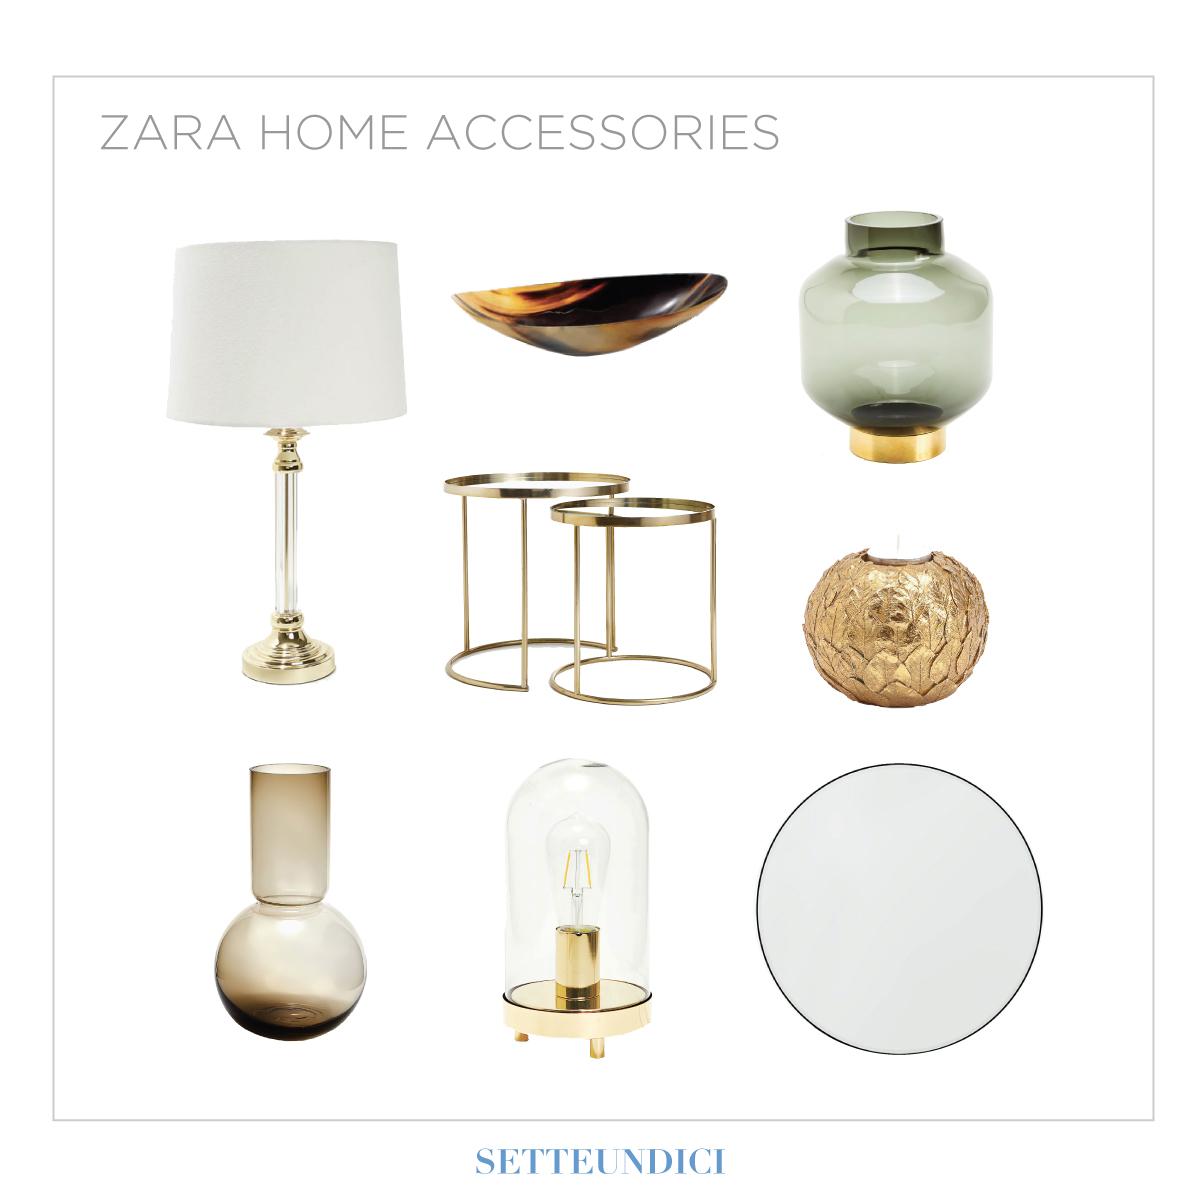 zara home accessories